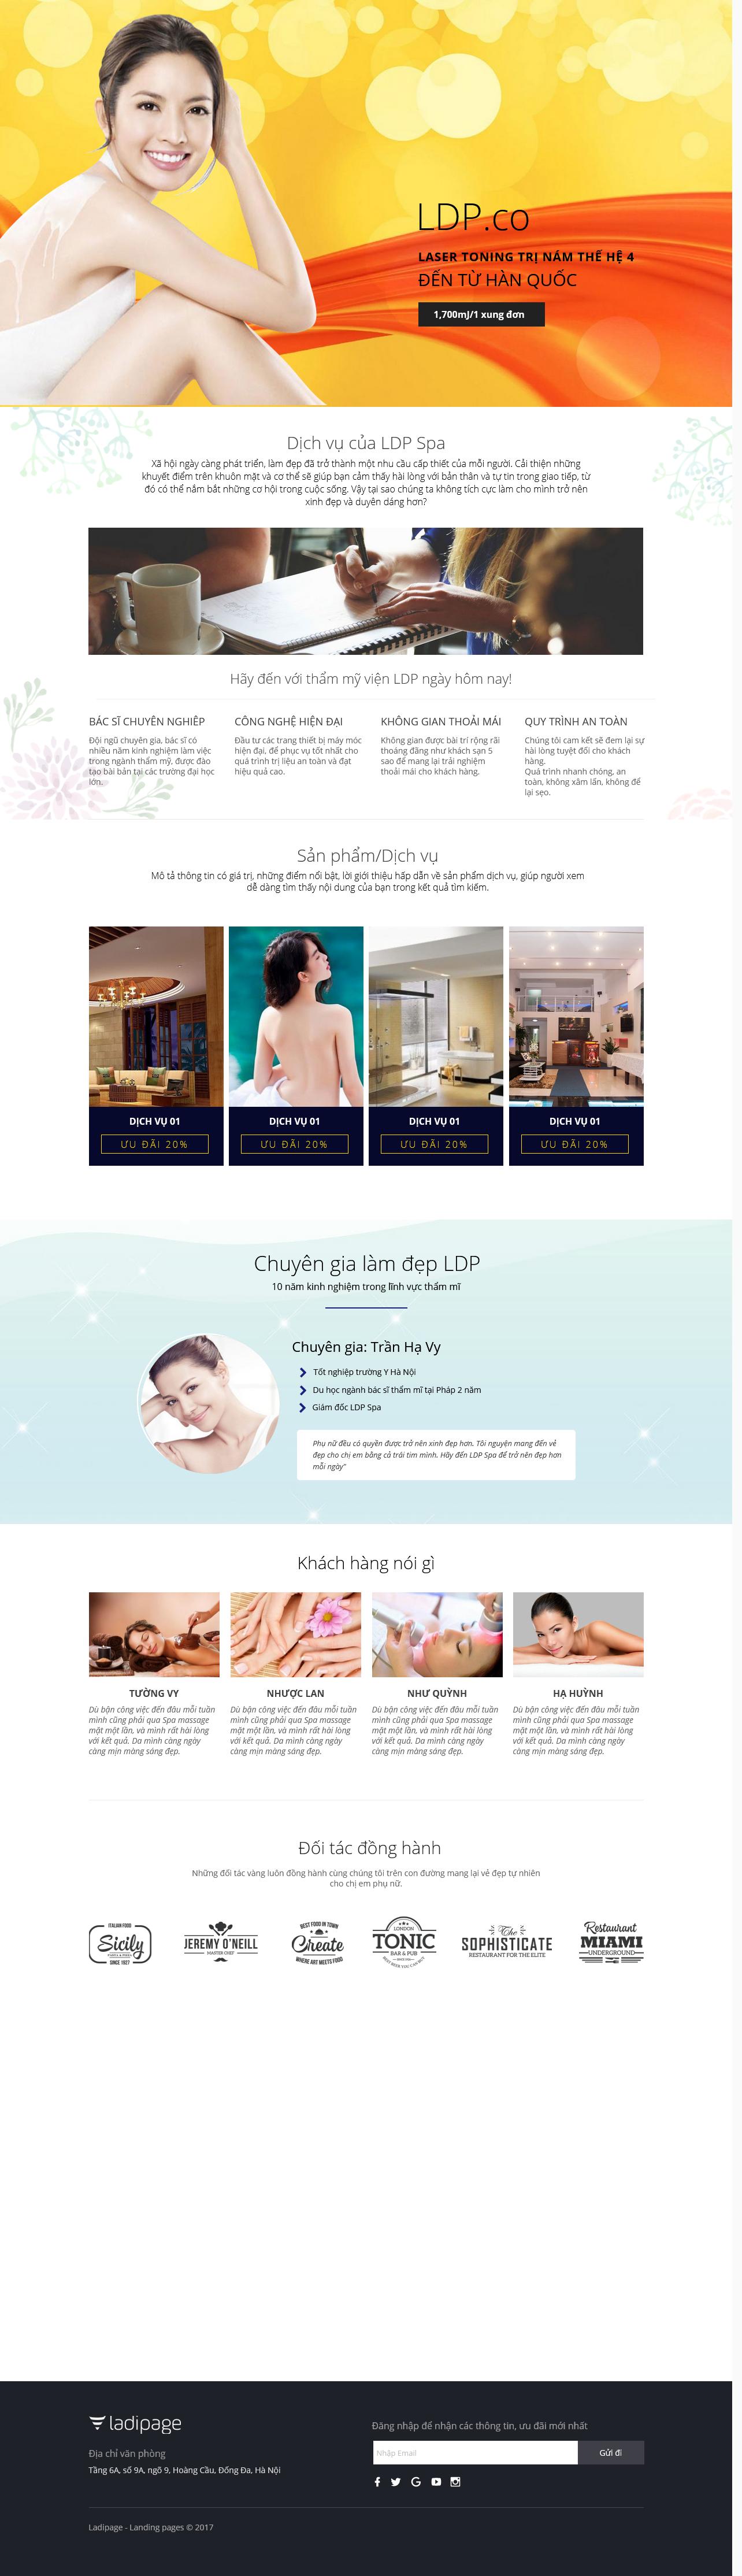 Thiết kế website Thiết kế webiste landingpage tham-my---spa---lam-dep Sức khỏe Làm đẹp 04